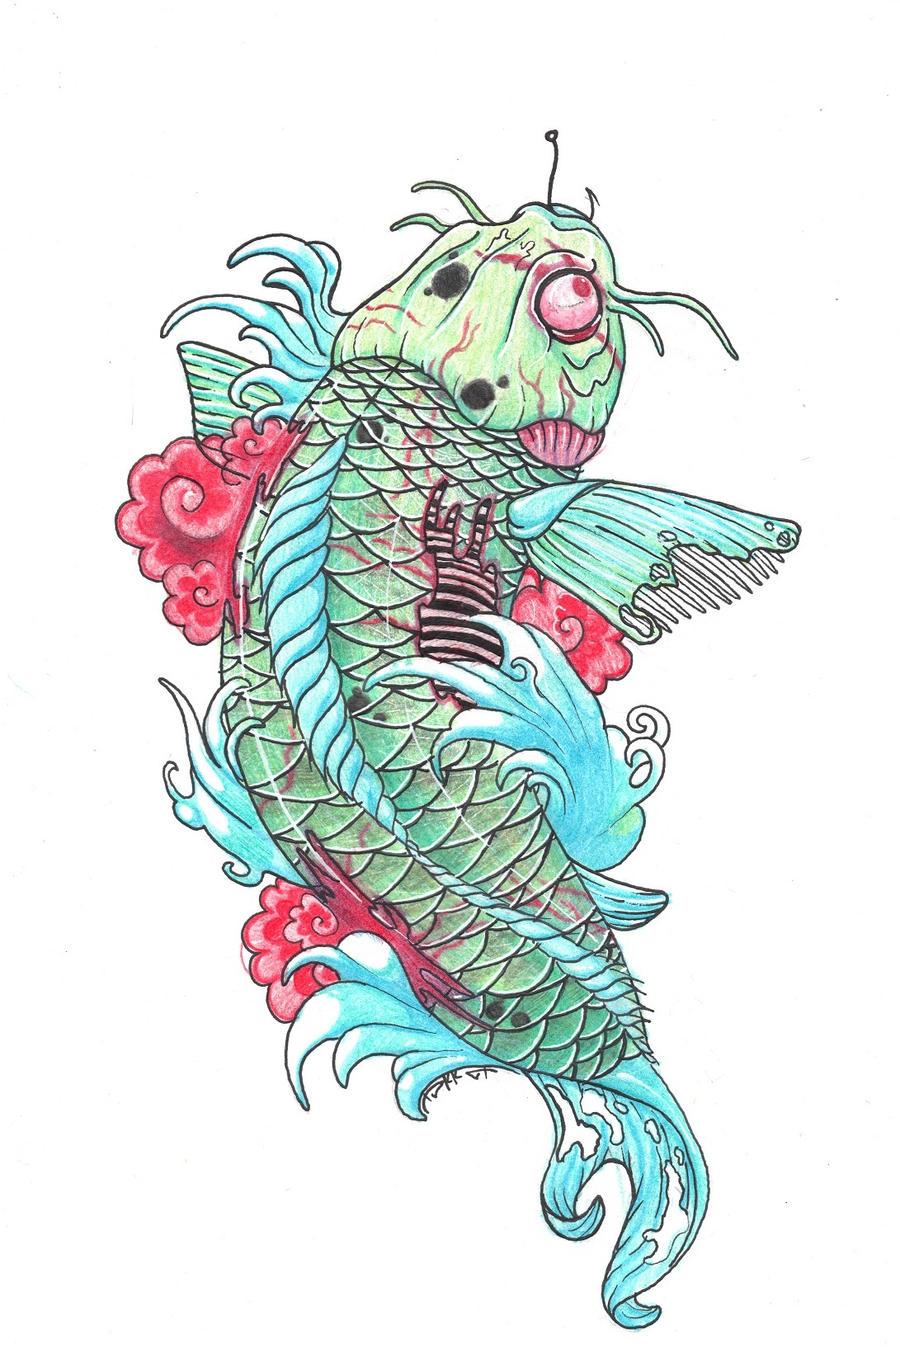 16 simple koi fish tattoo designs atom tattoo for Koi fish representation